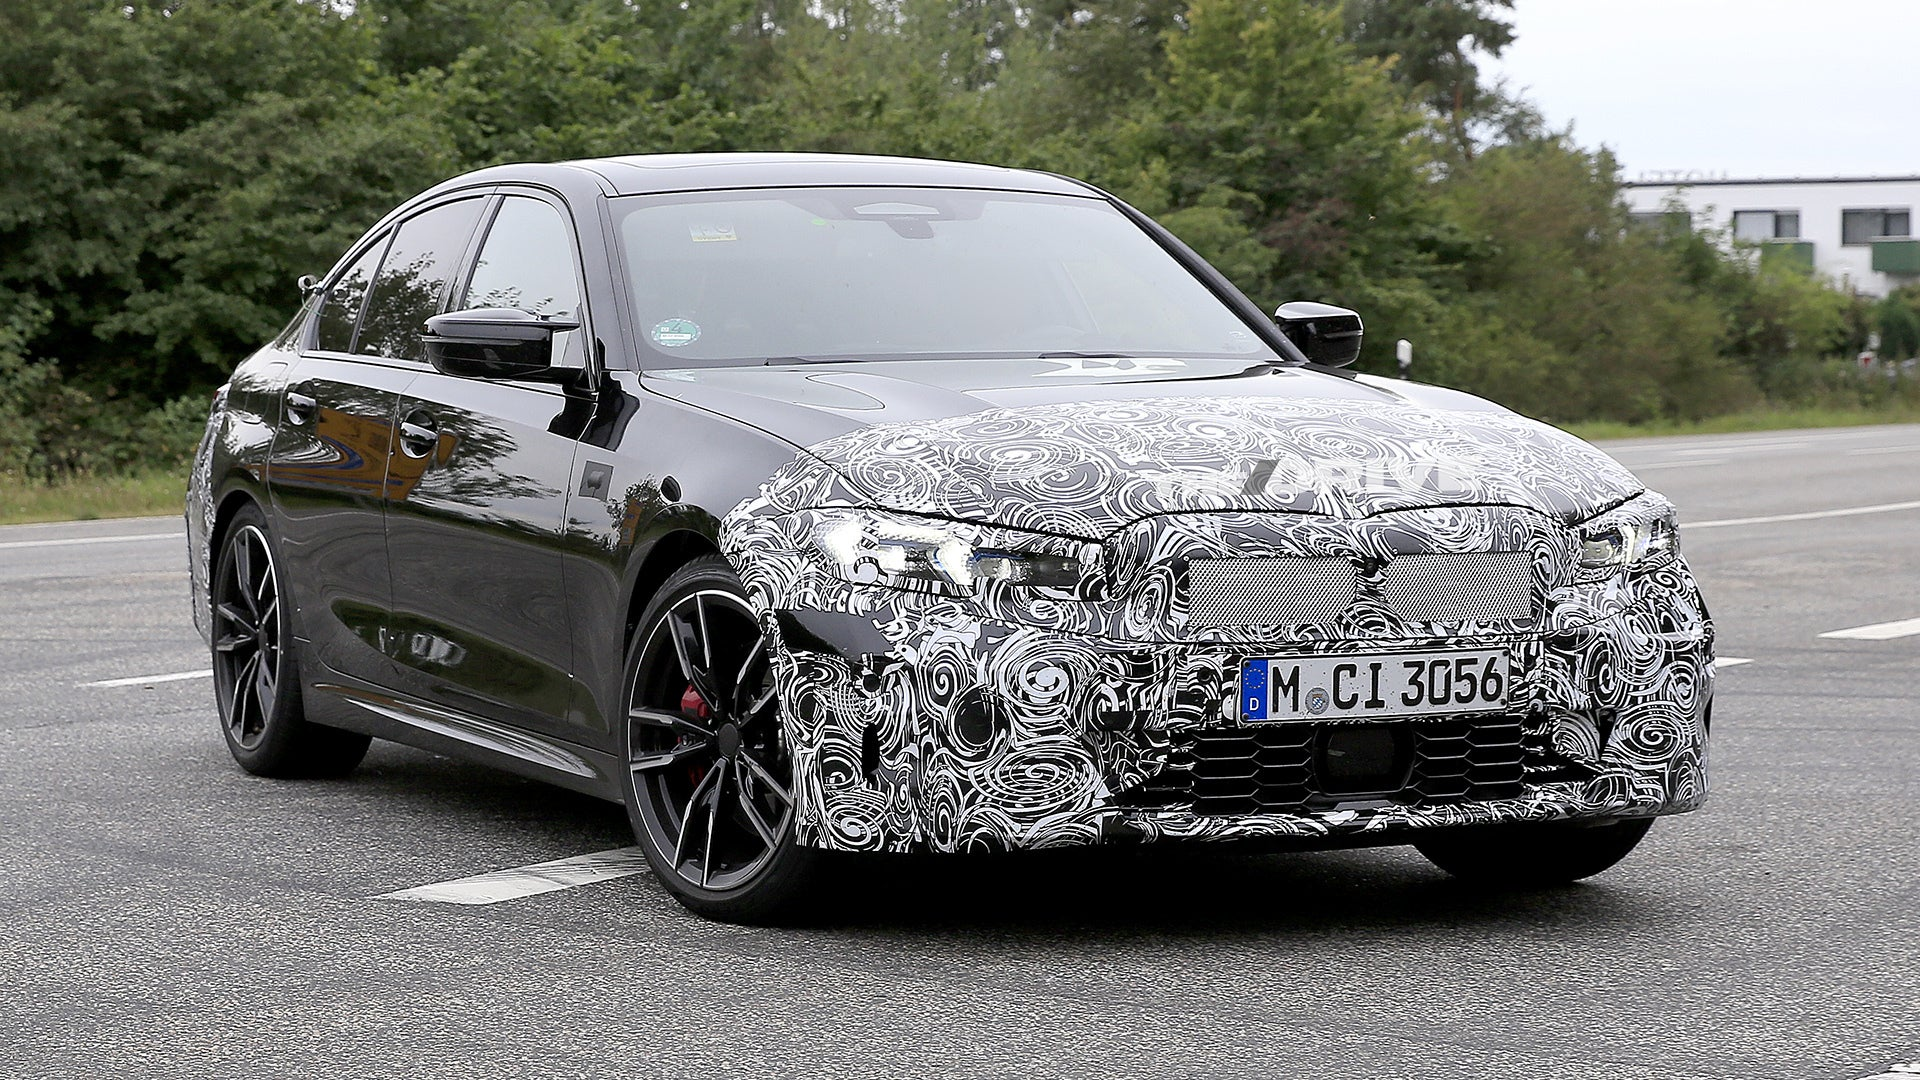 BMW-3-Series-Facelift-003-copy.jpg